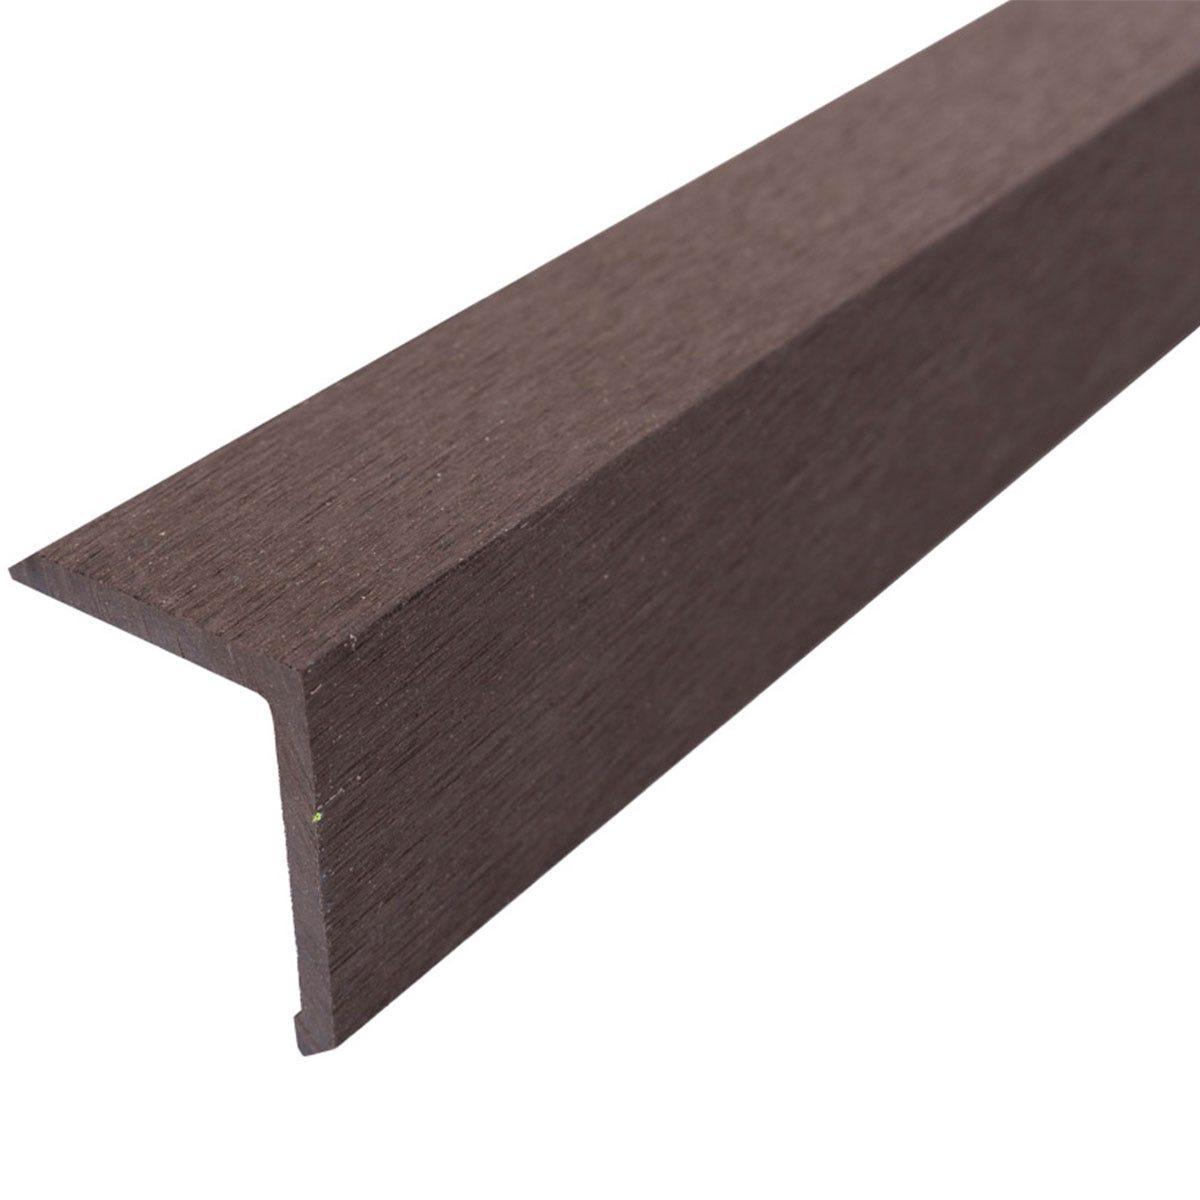 Select Composite Decking 1.8m Corner Trim Pk 5 - Coffee